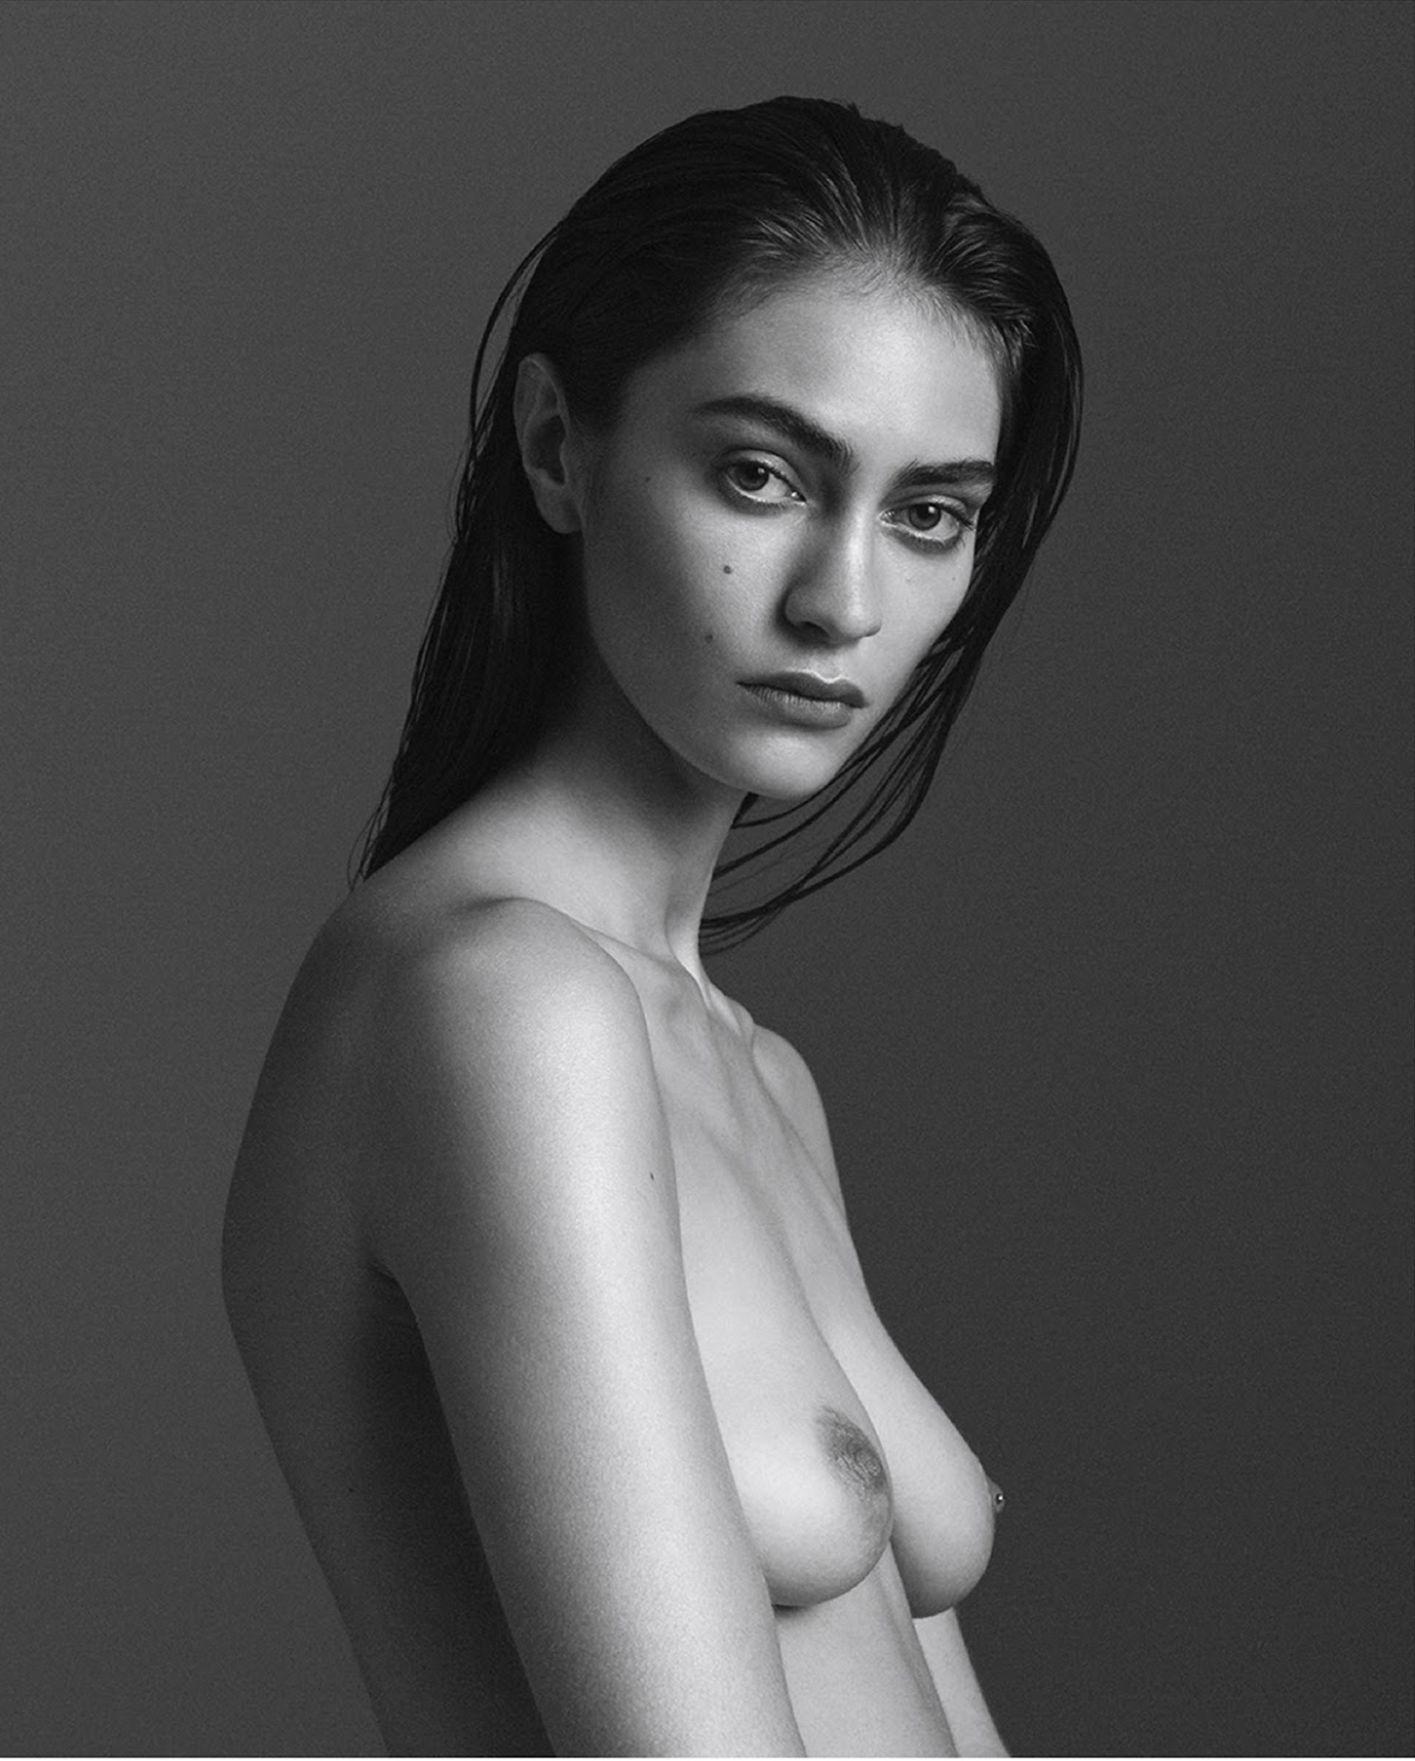 Marine Deleeuw Topless Ph...